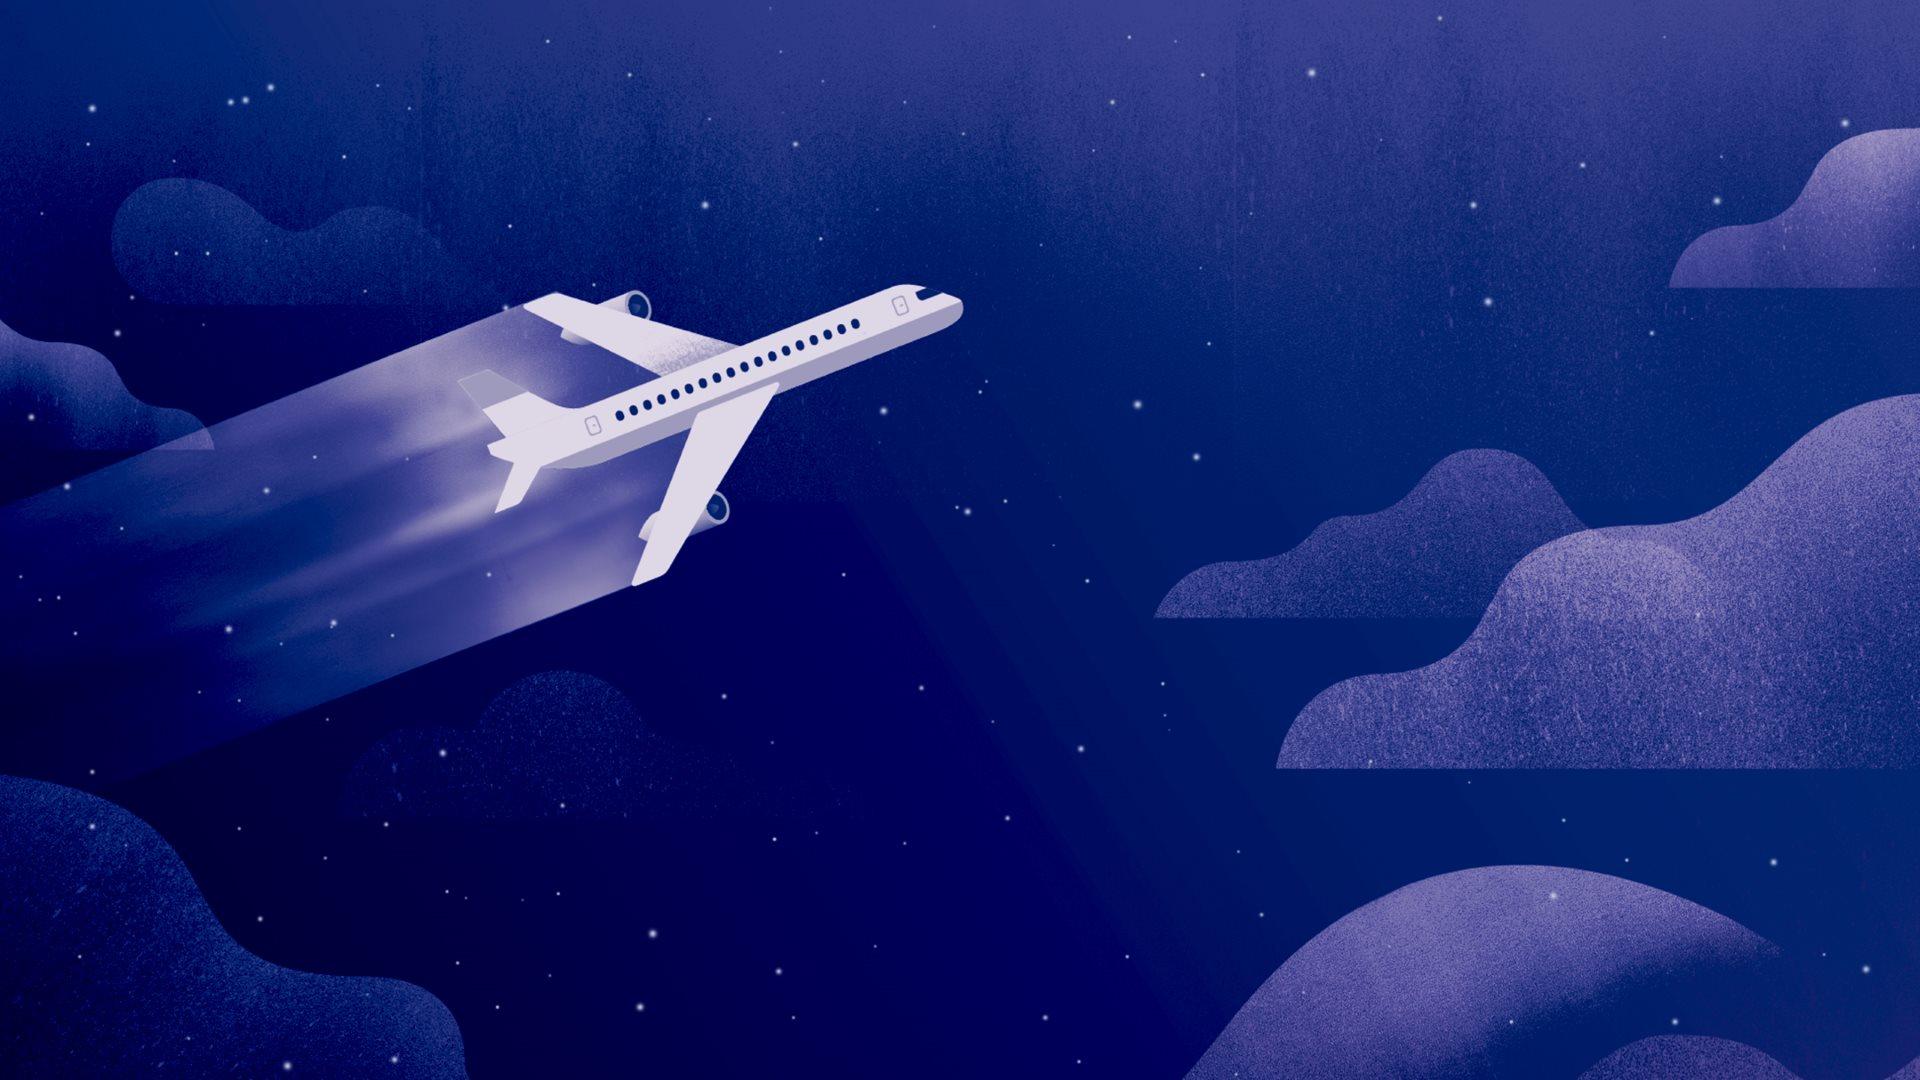 Best Wallpaper Night Airplane - Google%2BIO%2BPlane%2BDesign_HD  Snapshot.jpg